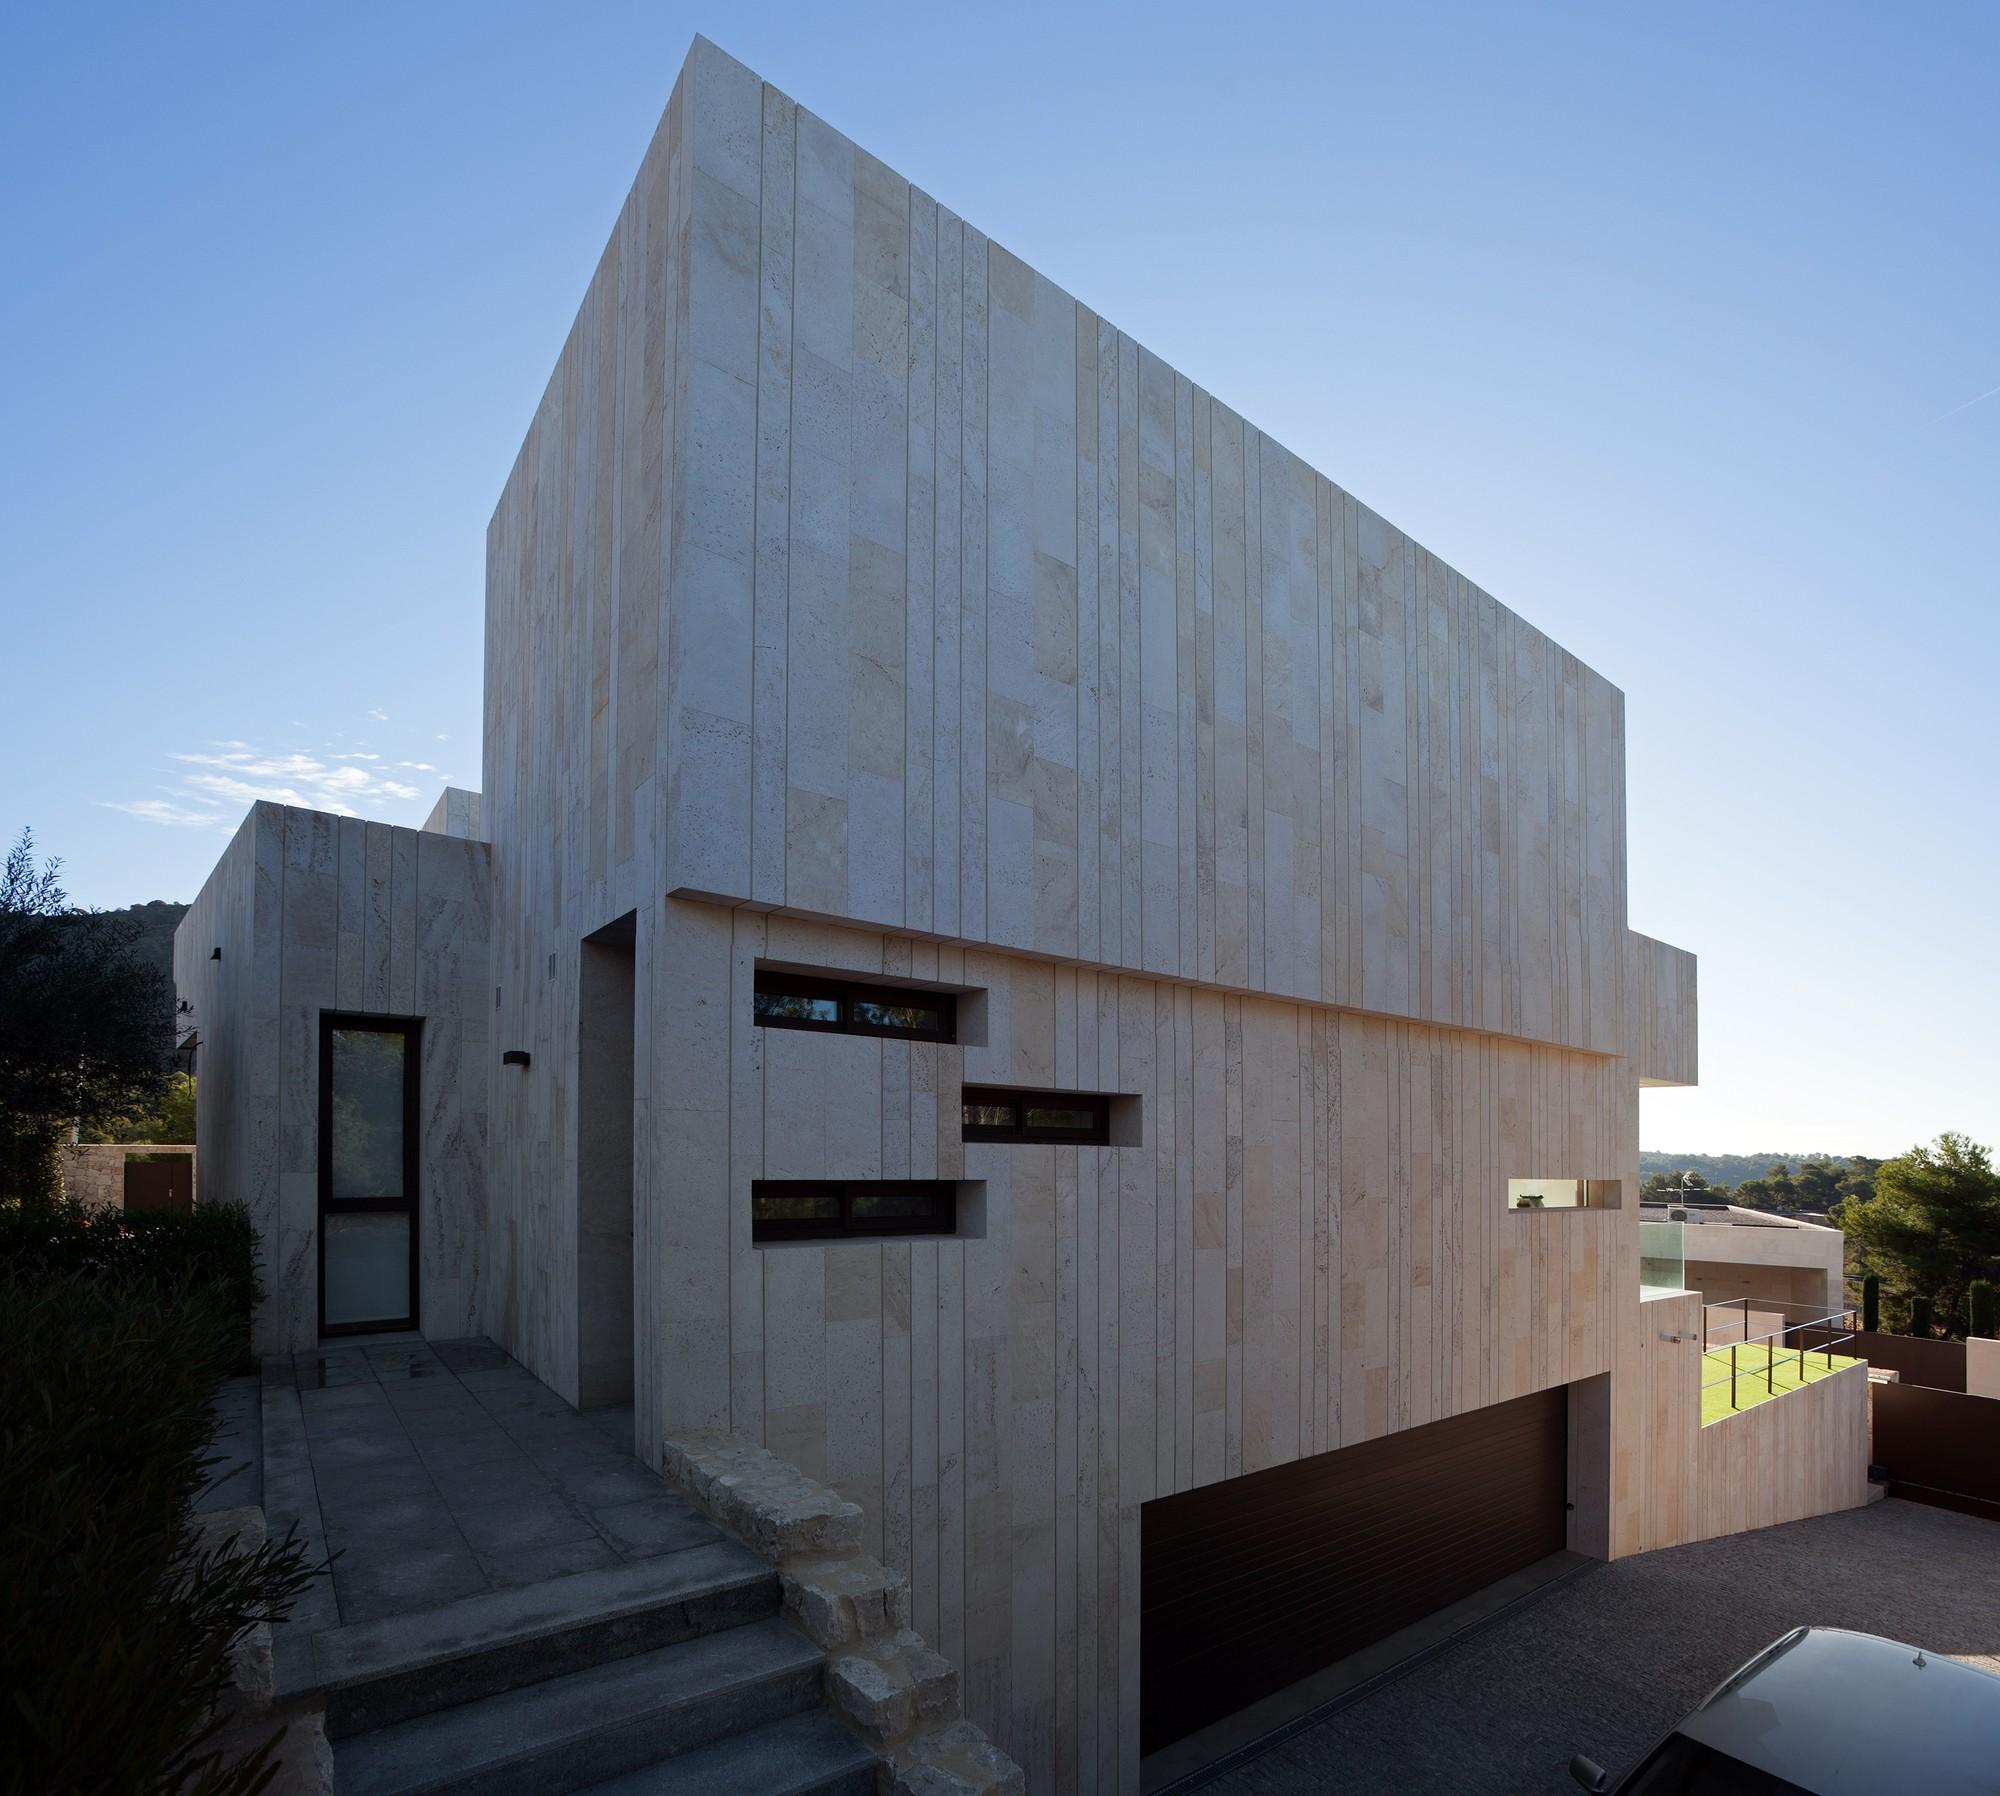 Monasterios House / Antonio Altarriba Comes